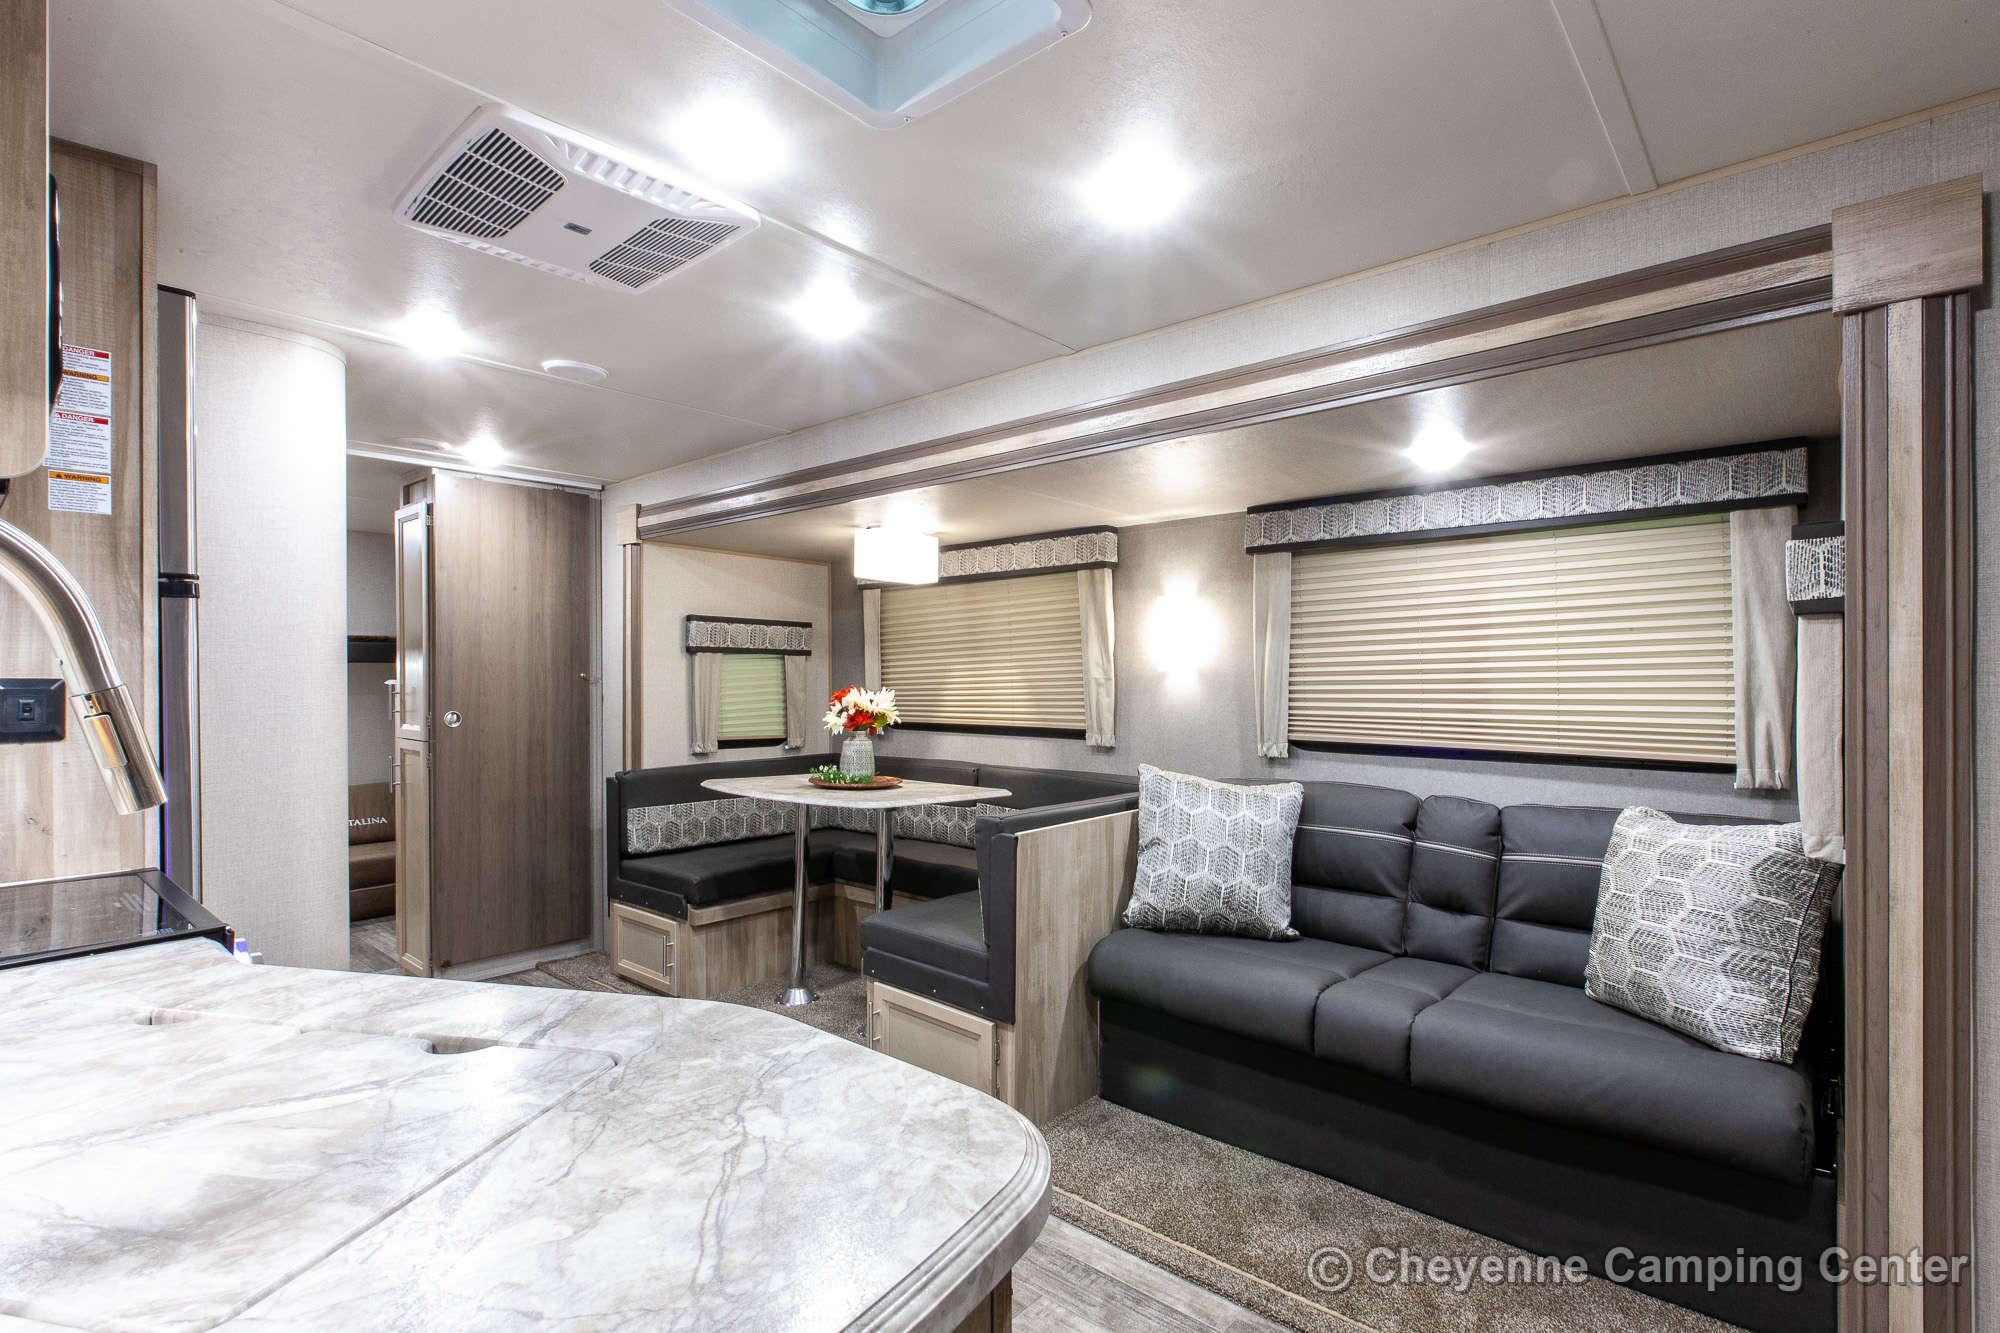 2021 Coachmen Catalina Legacy Edition 293QBCK Bunkhouse Travel Trailer Interior Image